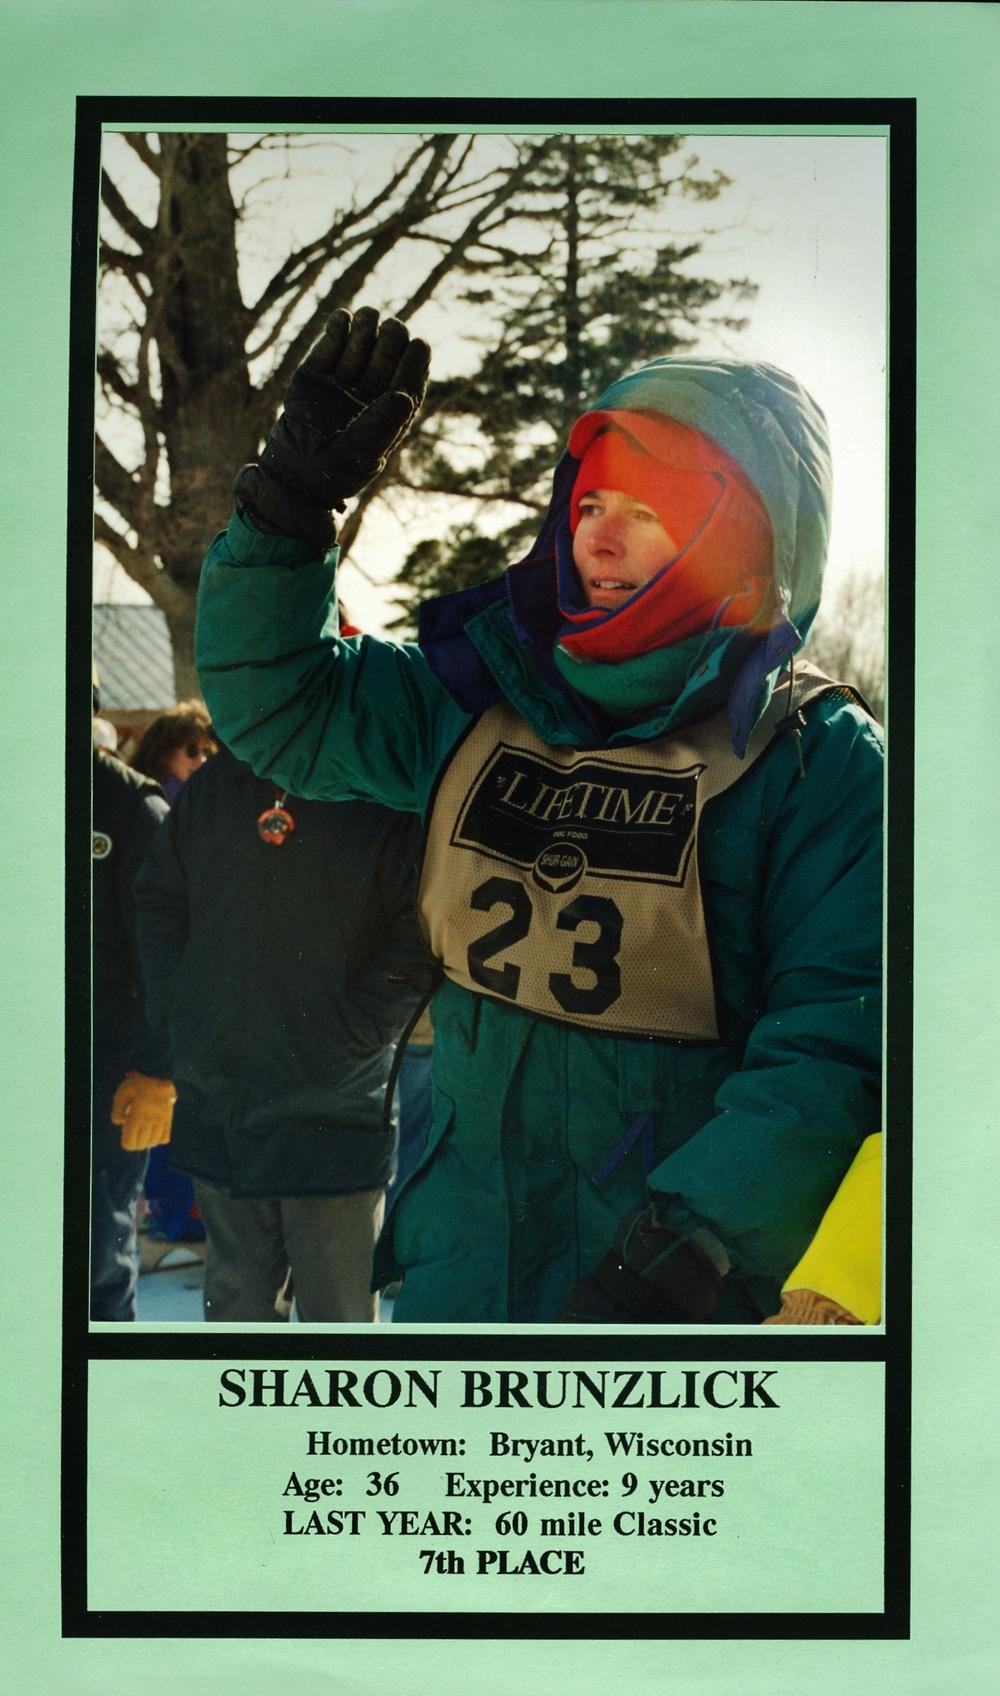 Snofest 1994 Sharon Brunzlick,  Bryant, Wisconsin.jpg